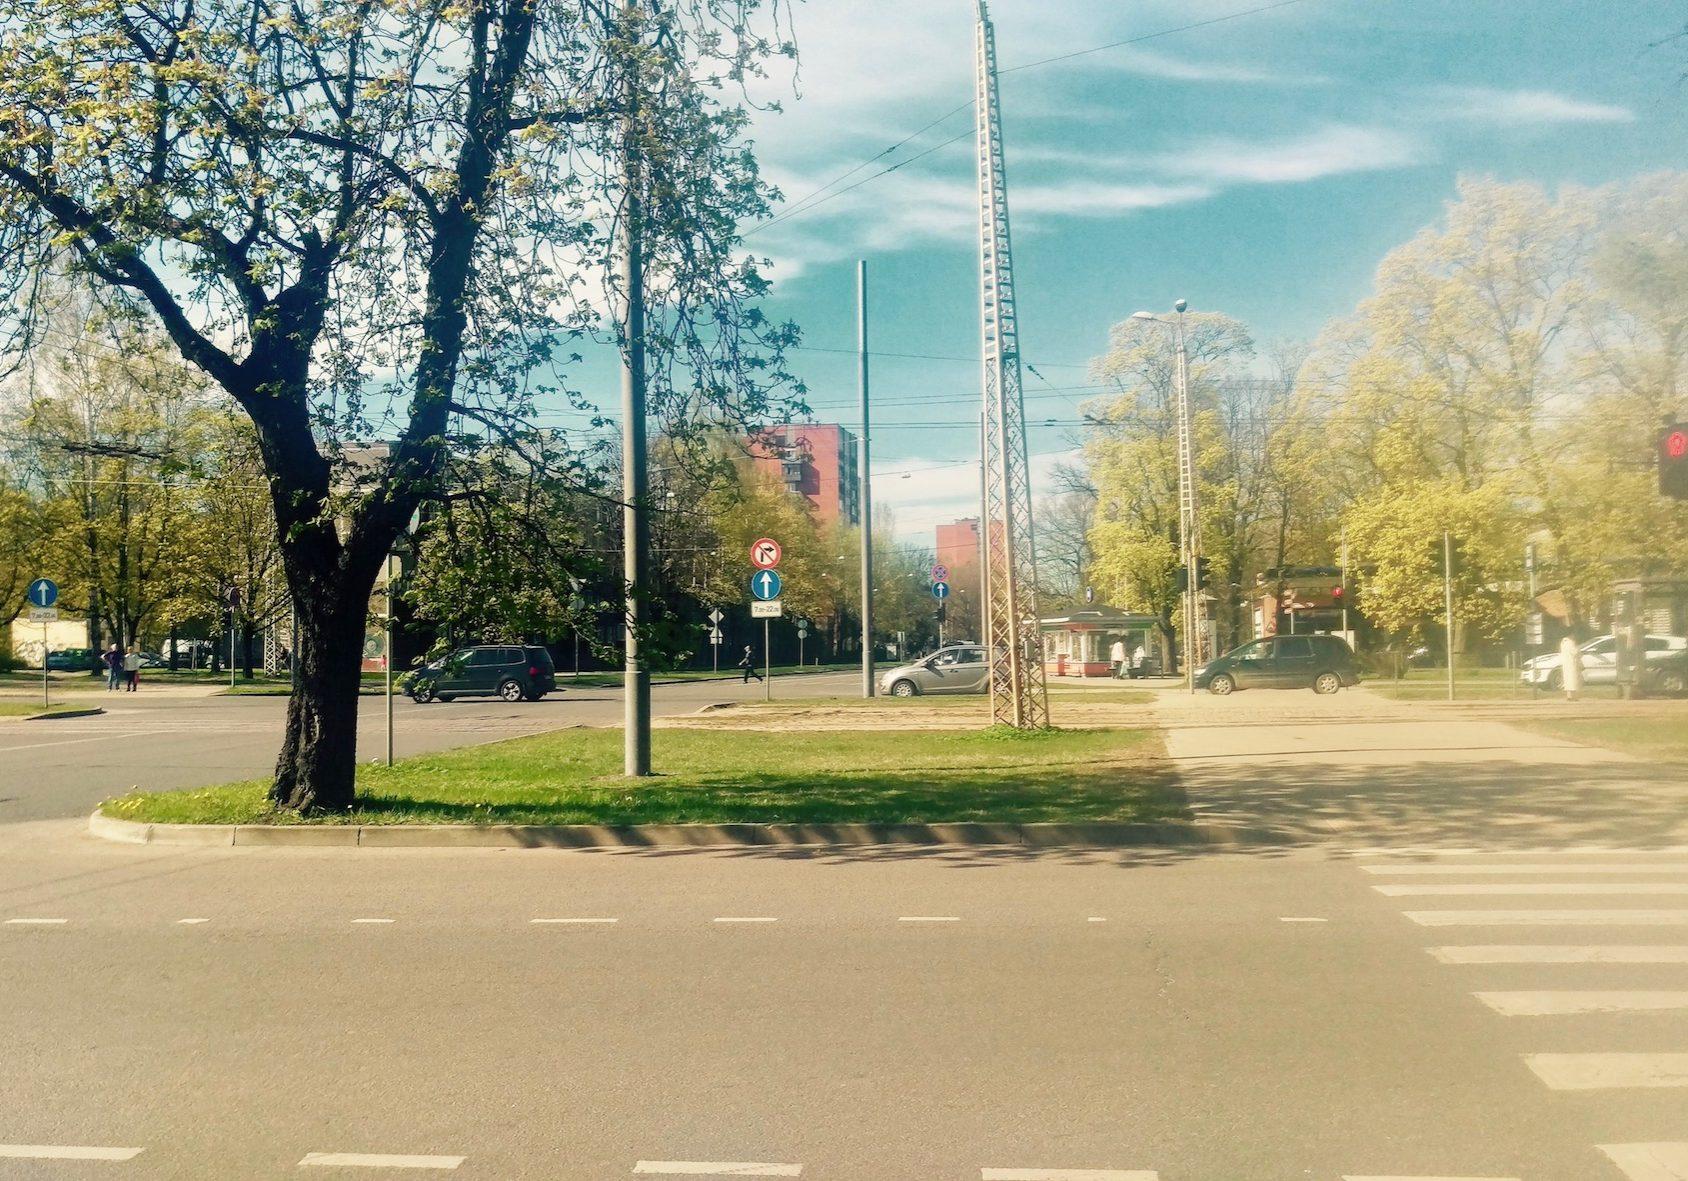 Intersection of Jurmalas gatave and Dzirciema street